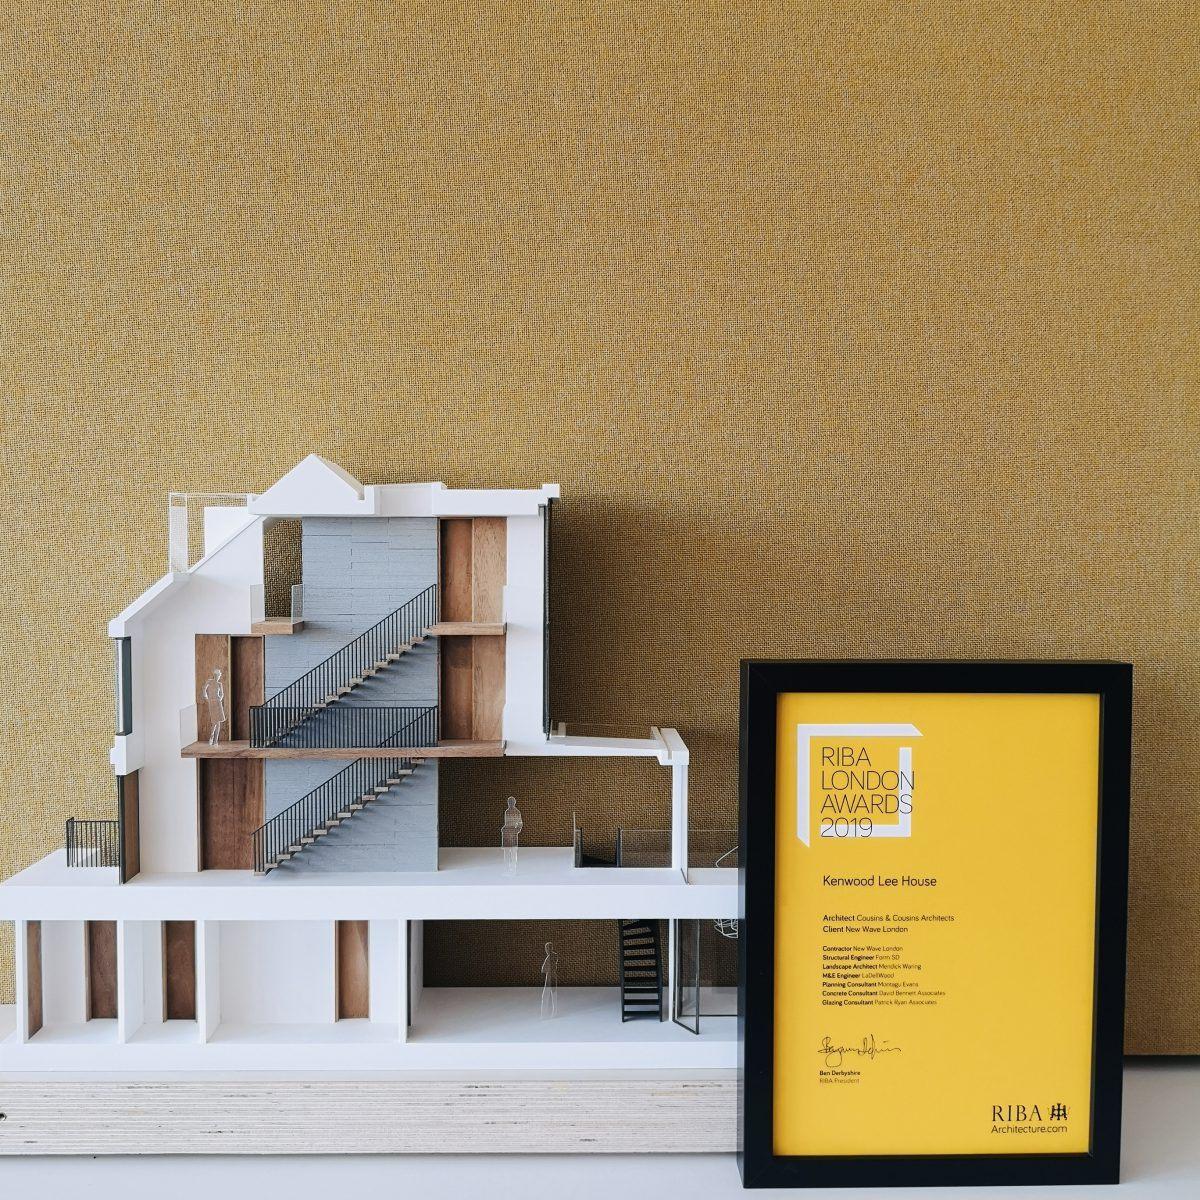 Kenwood Lee House Wins RIBA London Award